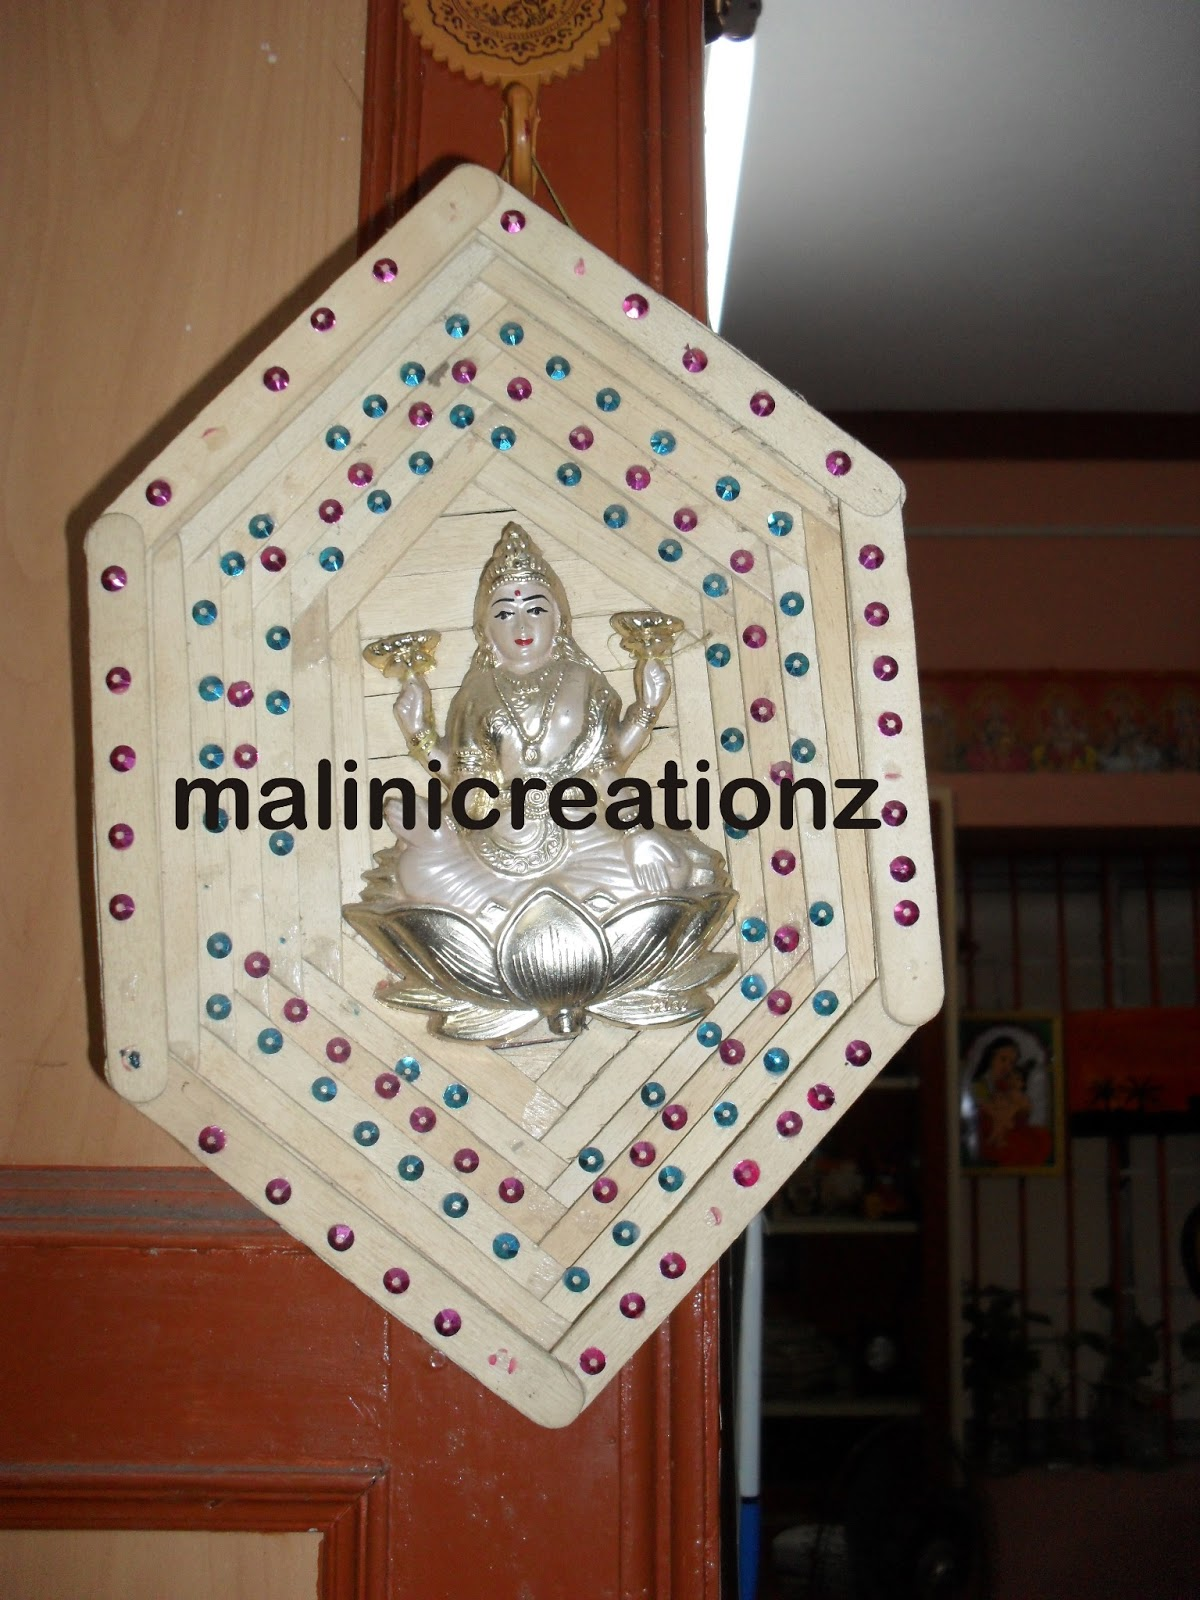 Malini S Creationz Popscile Ice Cream Stick Crafts